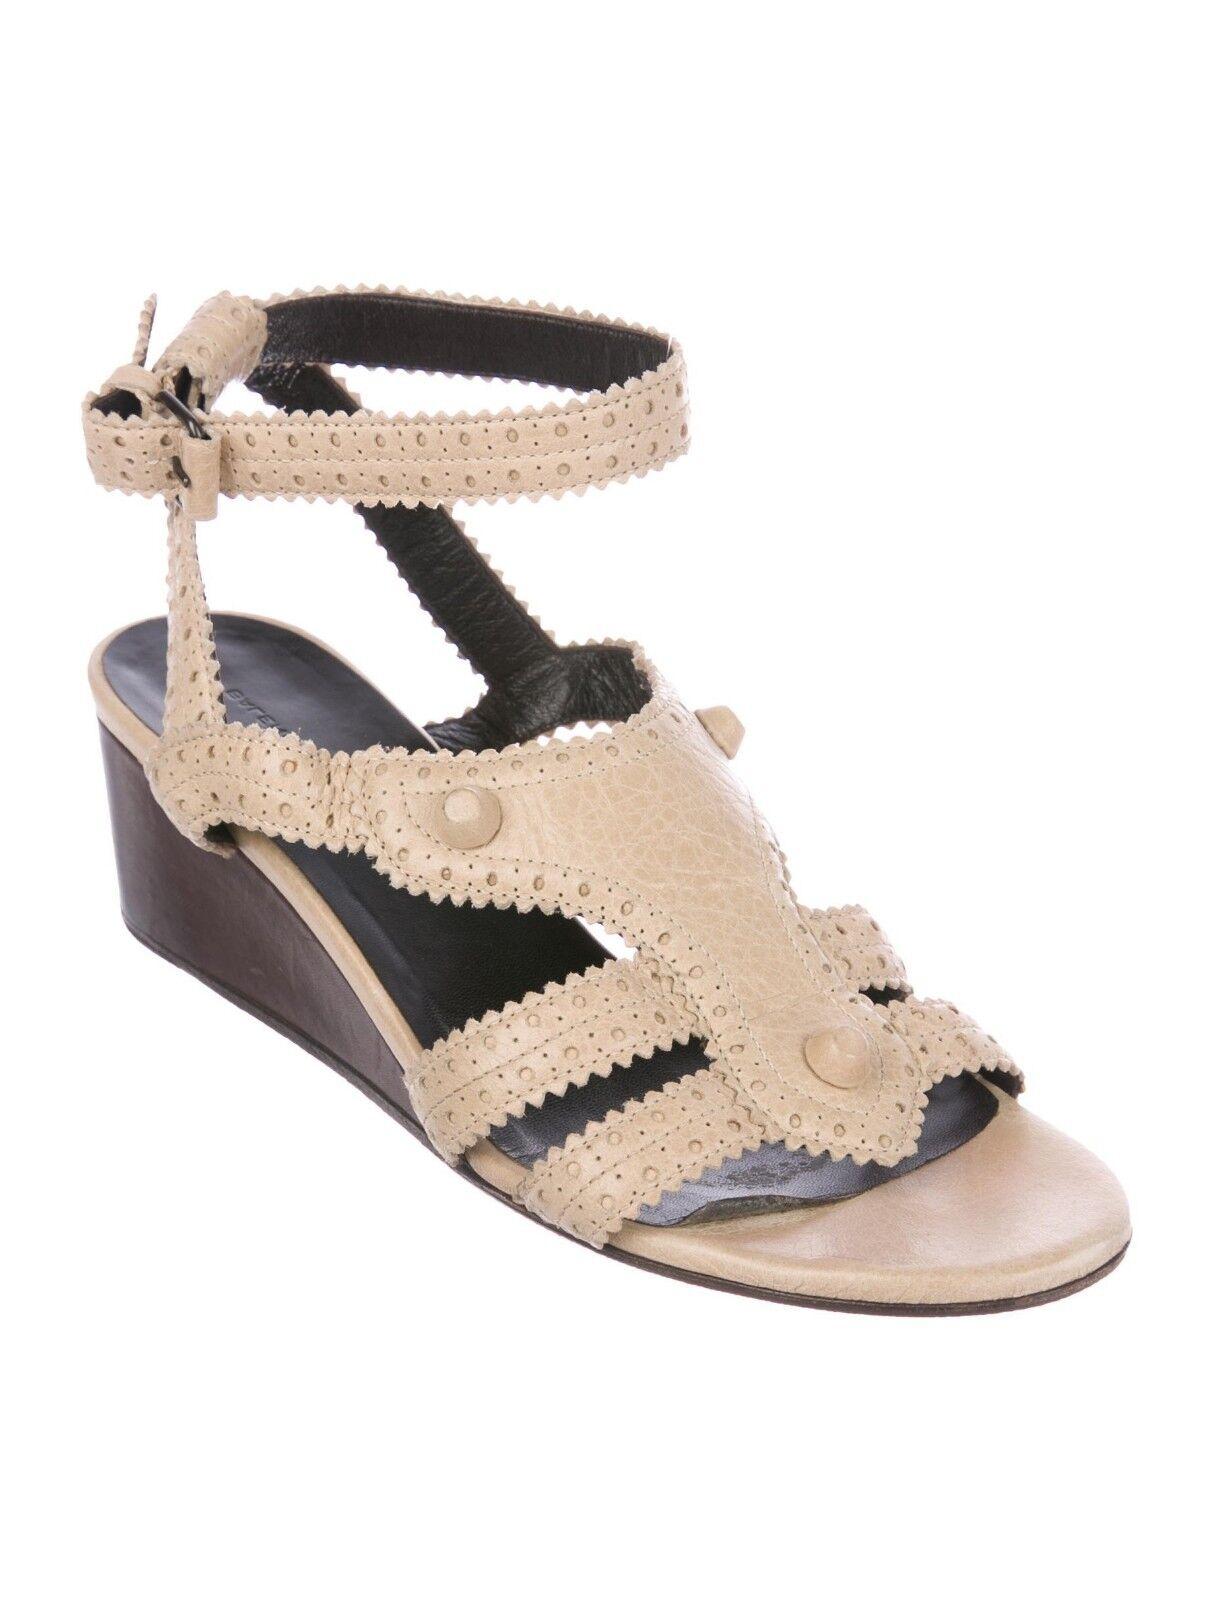 Balenciaga Stud Agneau Agneau Agneau Leather Brogue Sandal Wedge 35.5 5 Ankle Strap Tan Beige 5e5cd6